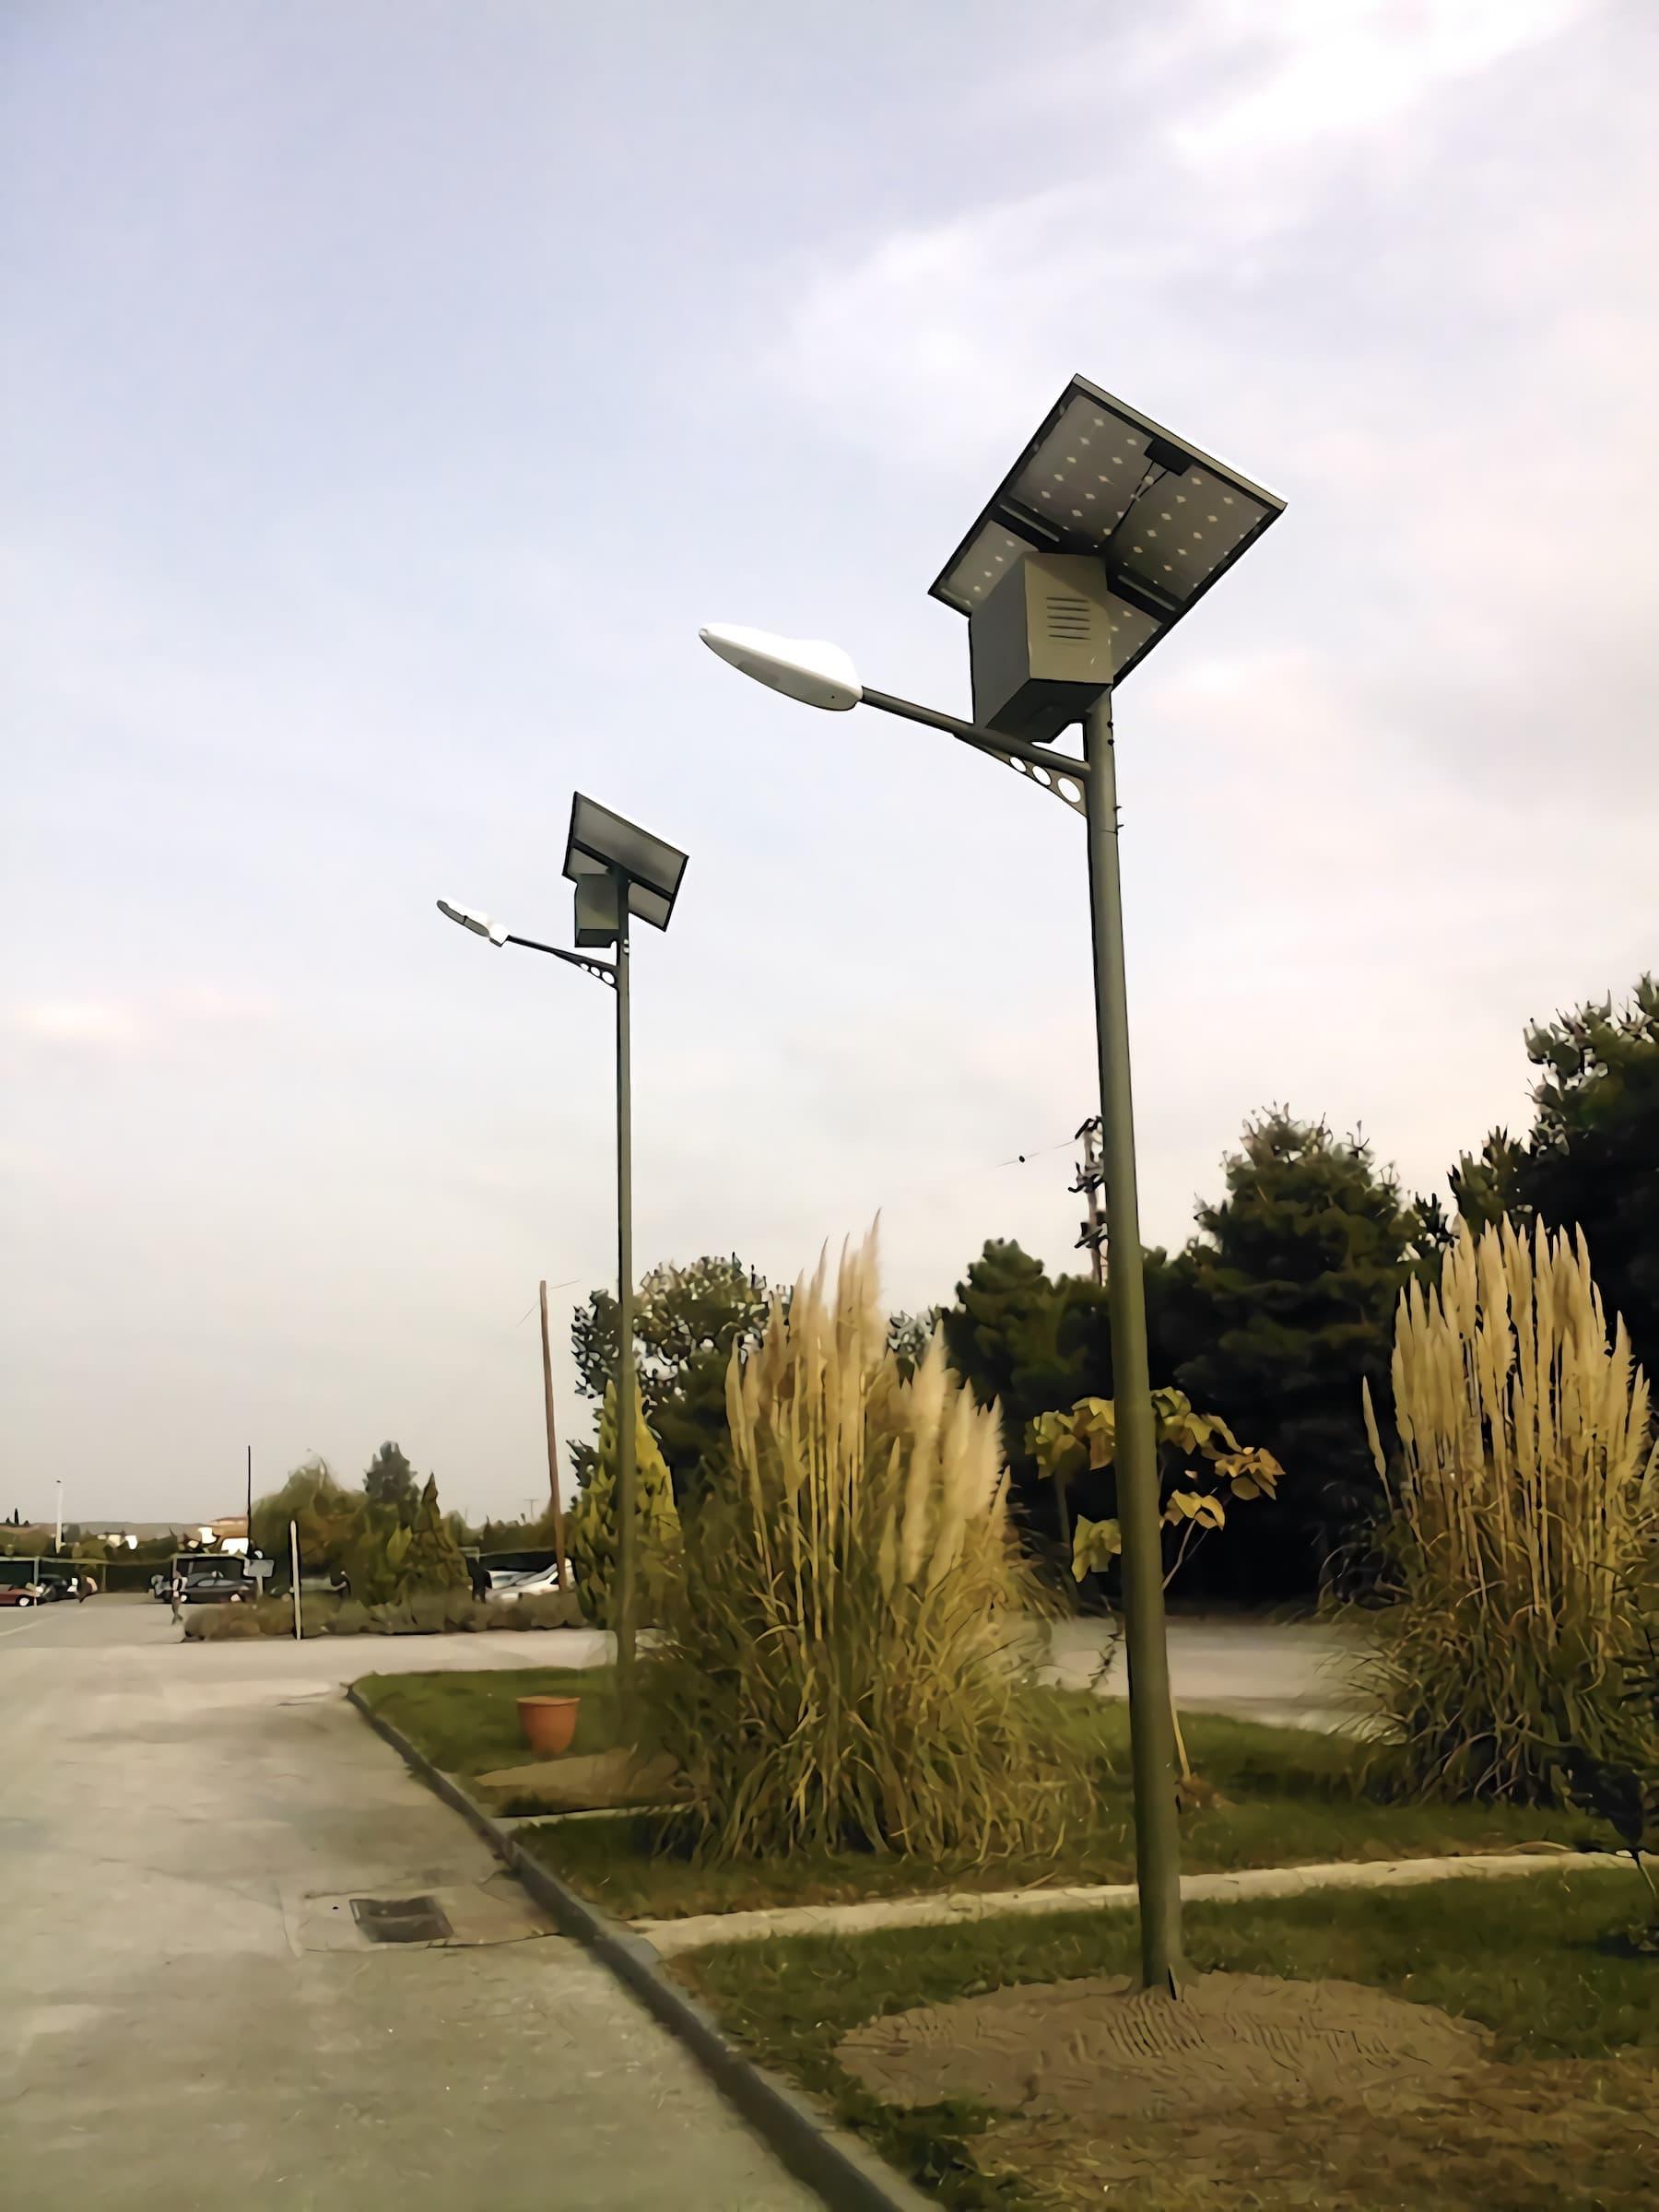 solar-street-light-split-type-35-watts-installation-in-Lagos-of-Nigeria